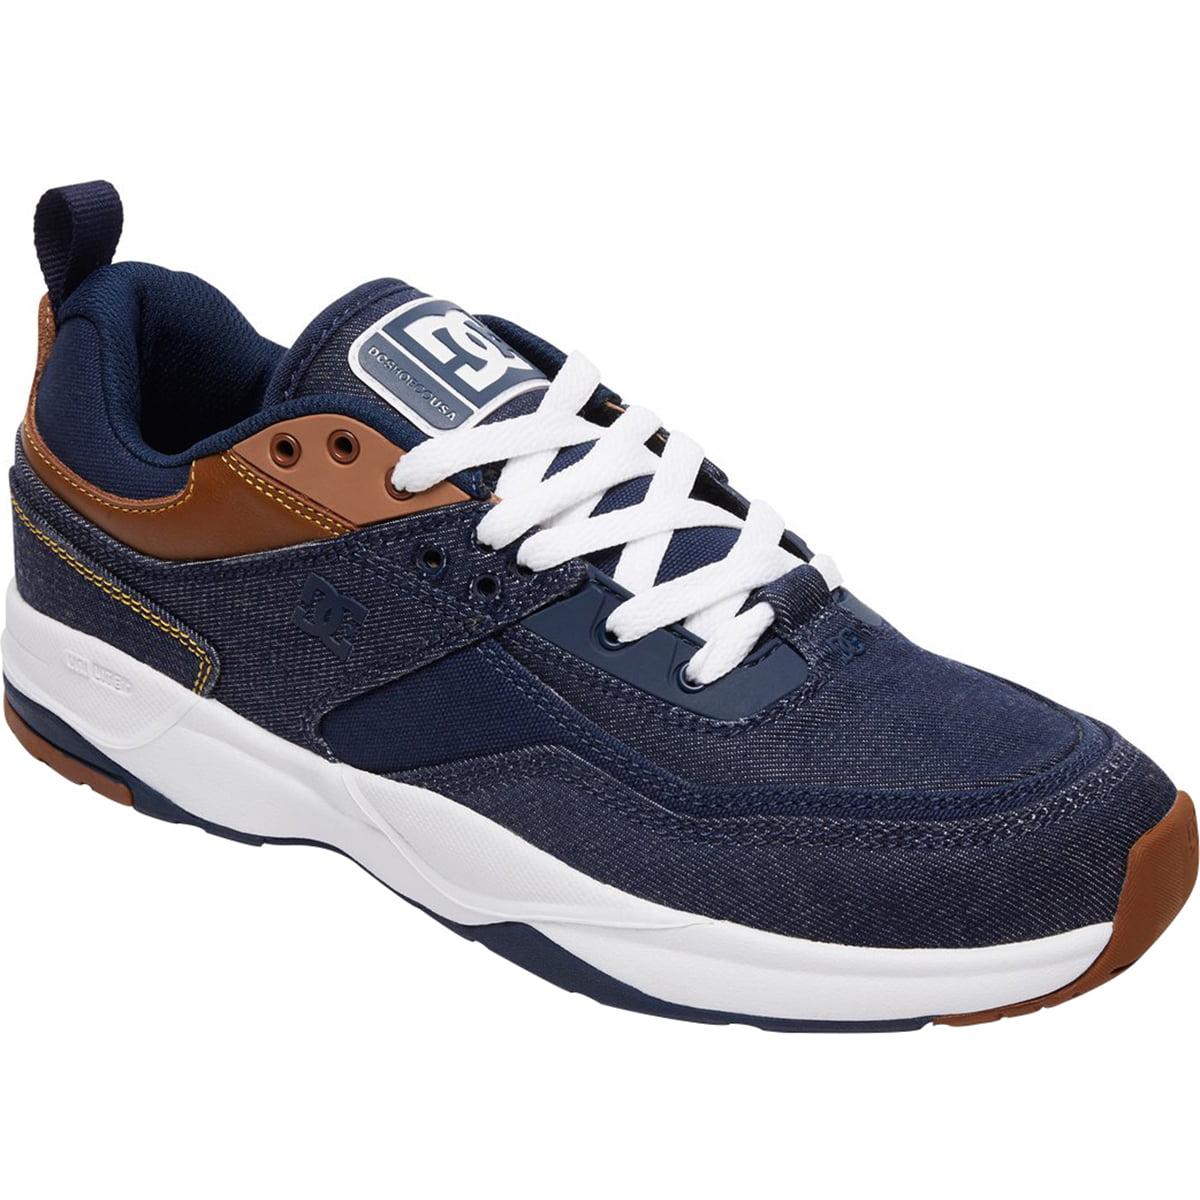 shoes with e logo